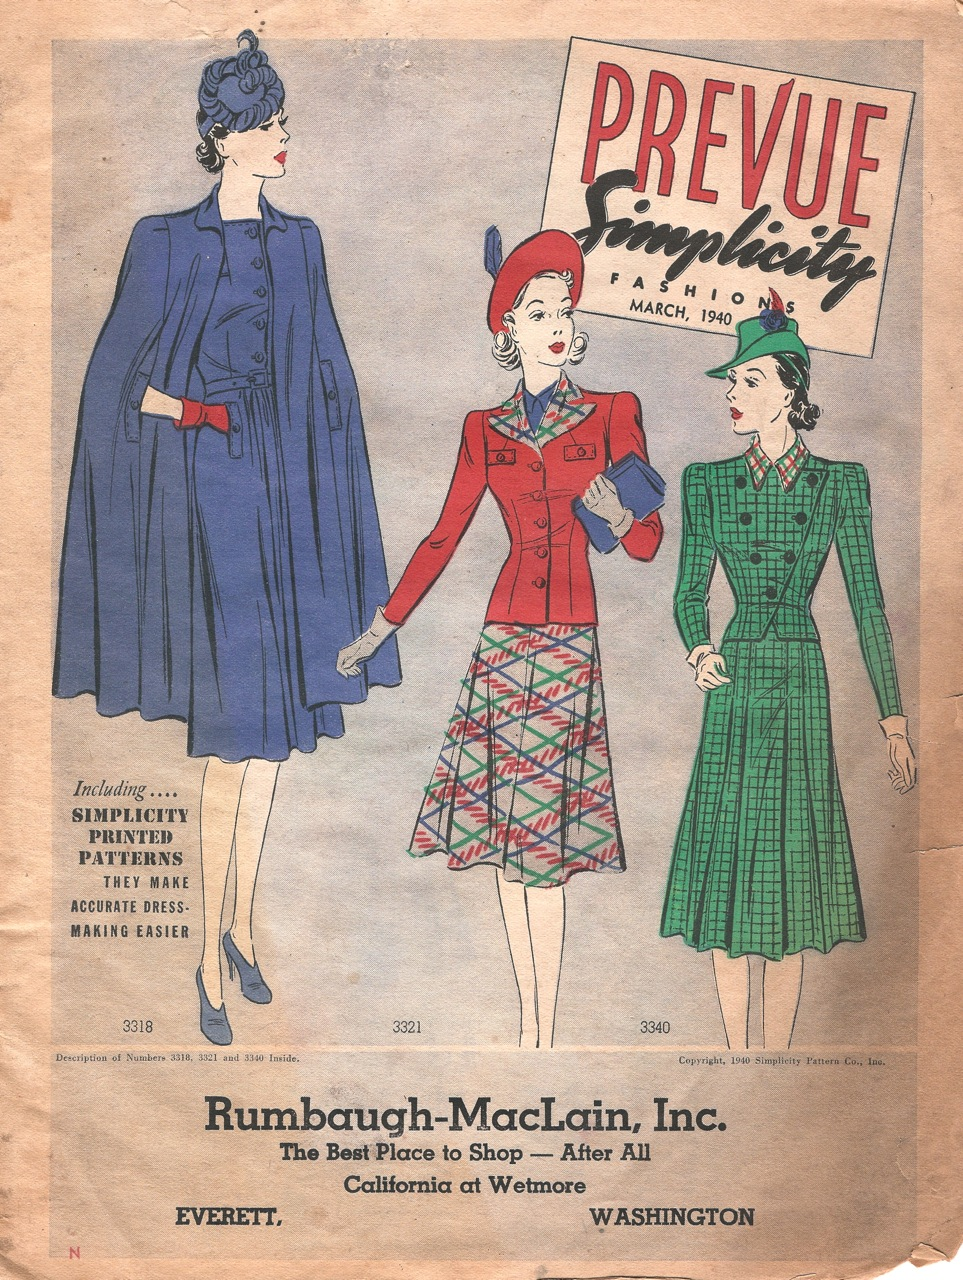 Simplicity Prevue March 1940